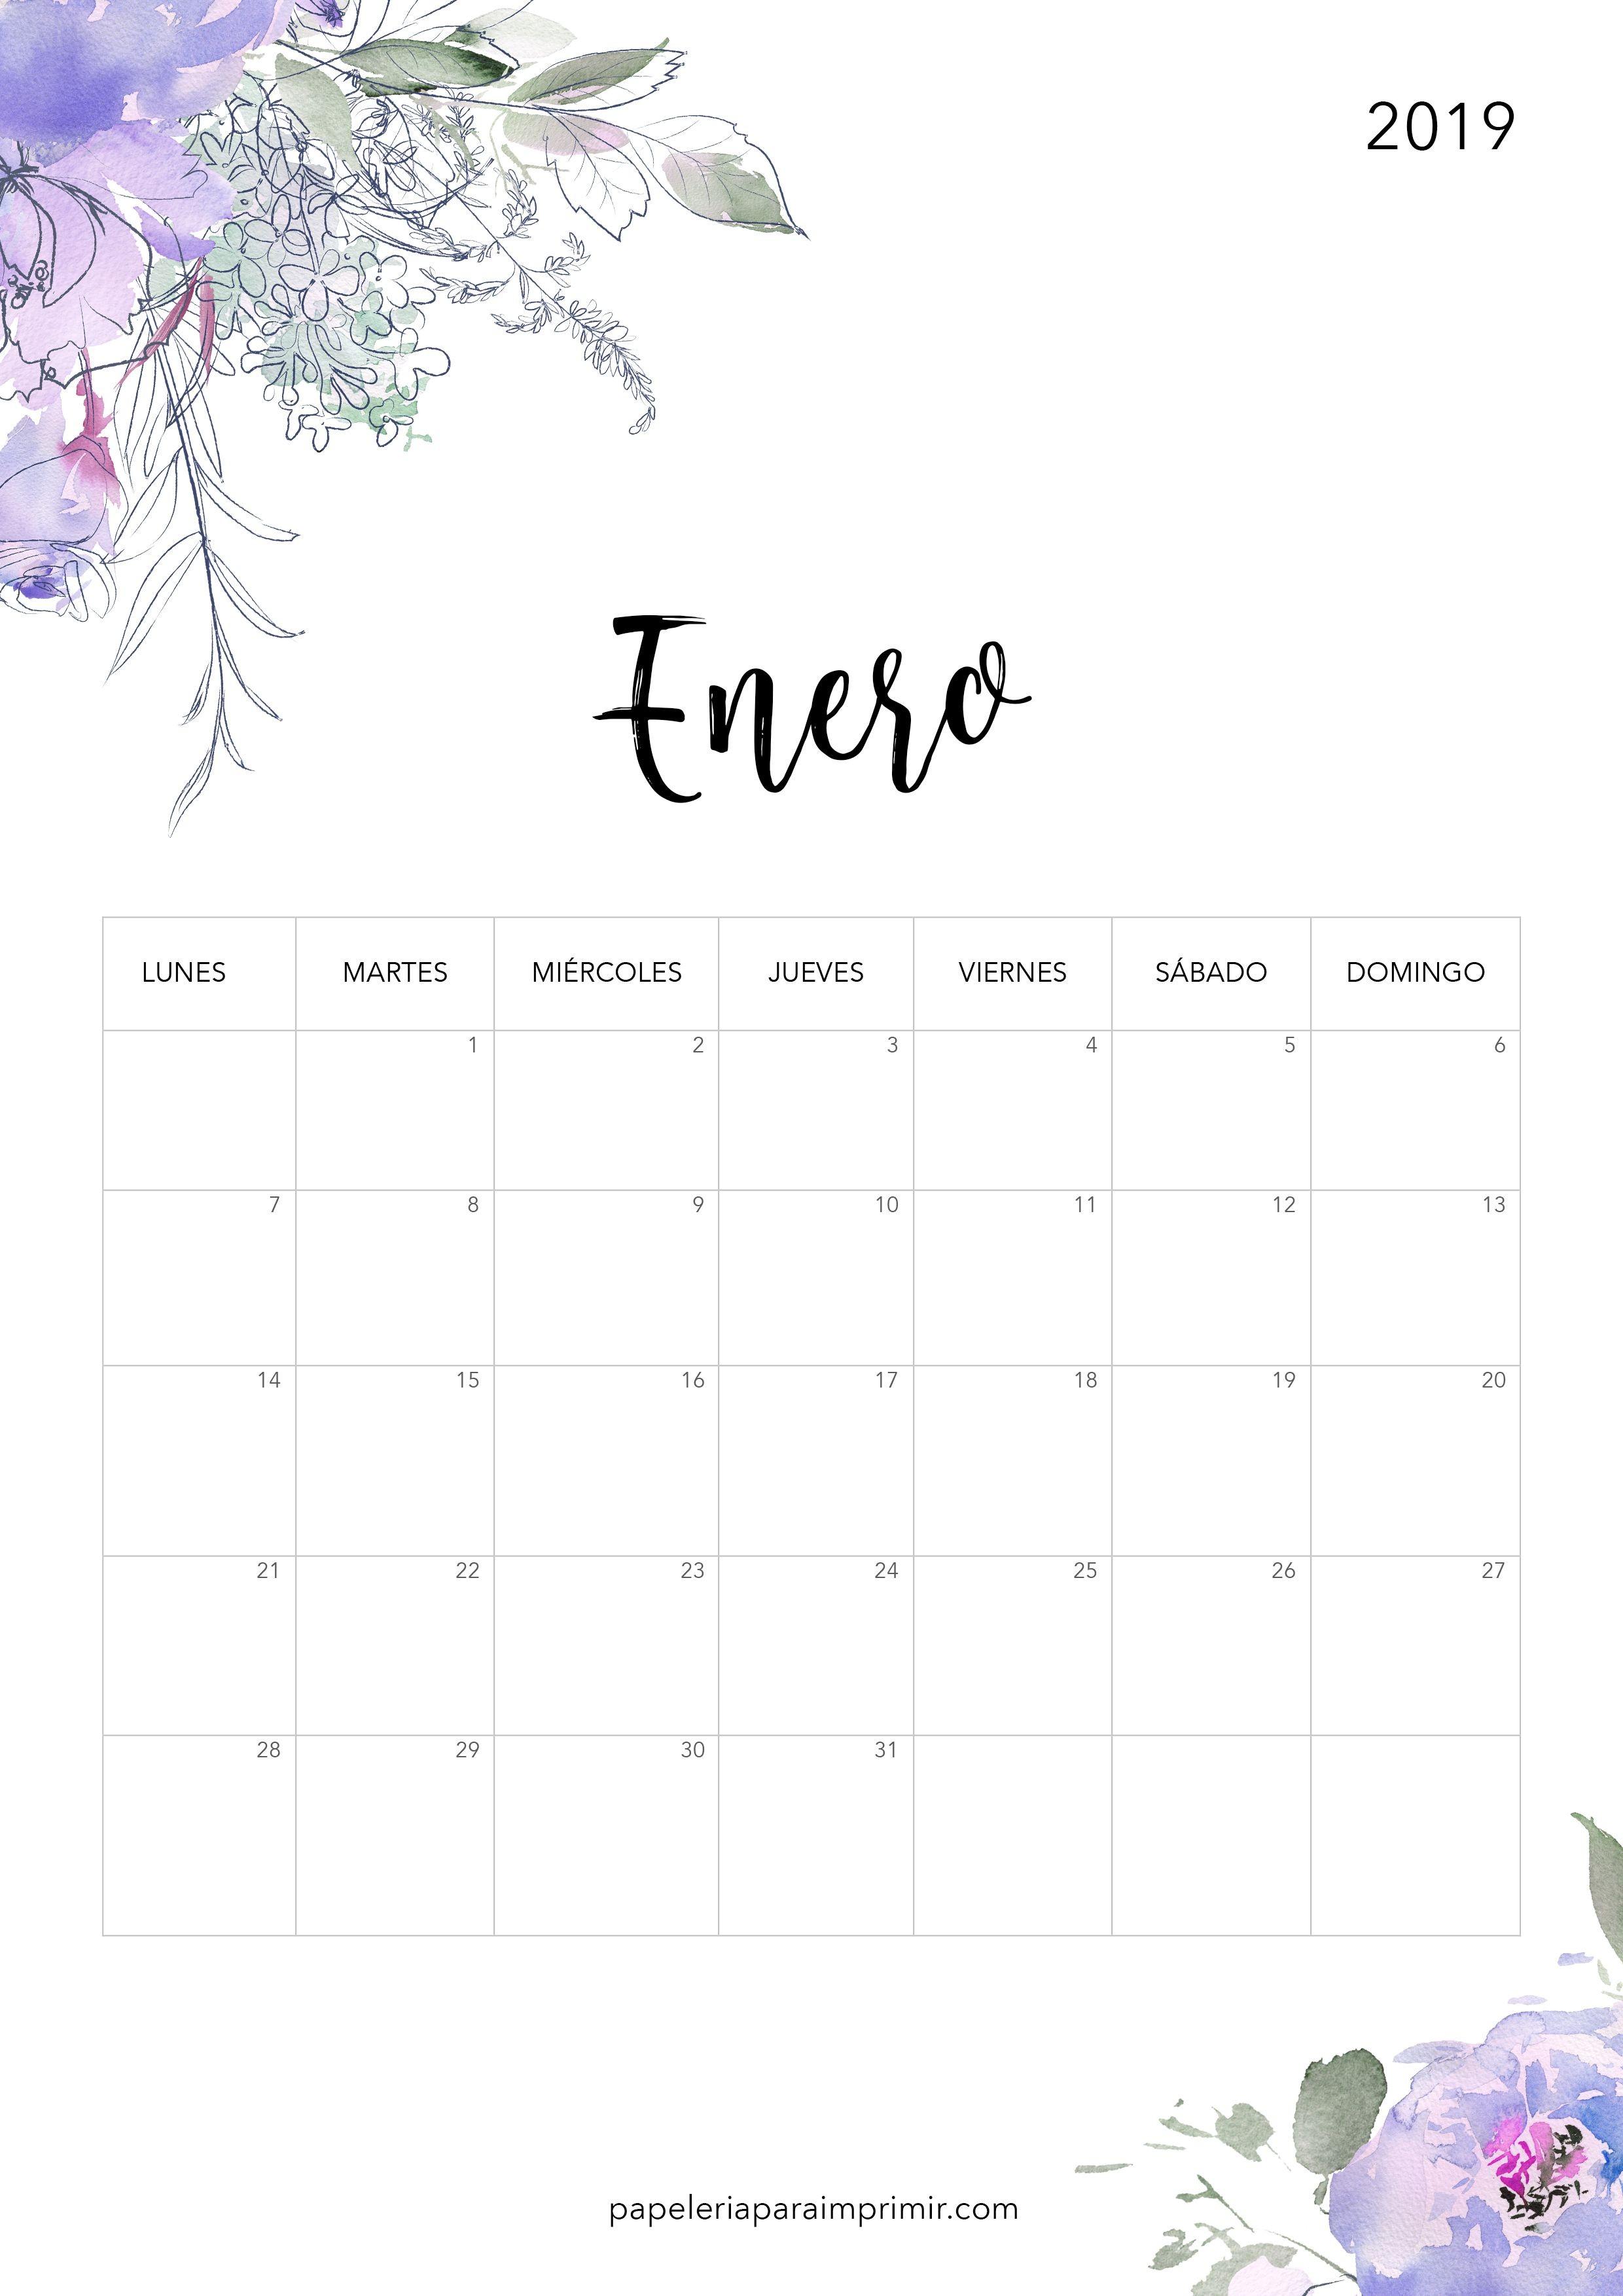 Calendario Mensual 2019 Para Imprimir Bonito Actual Calendario Para Imprimir 2019 Enero Calendario Imprimir Enero Of Calendario Mensual 2019 Para Imprimir Bonito Más Populares Imprimir Calendario Cheap Calendario Enero Para Imprimir Agosto